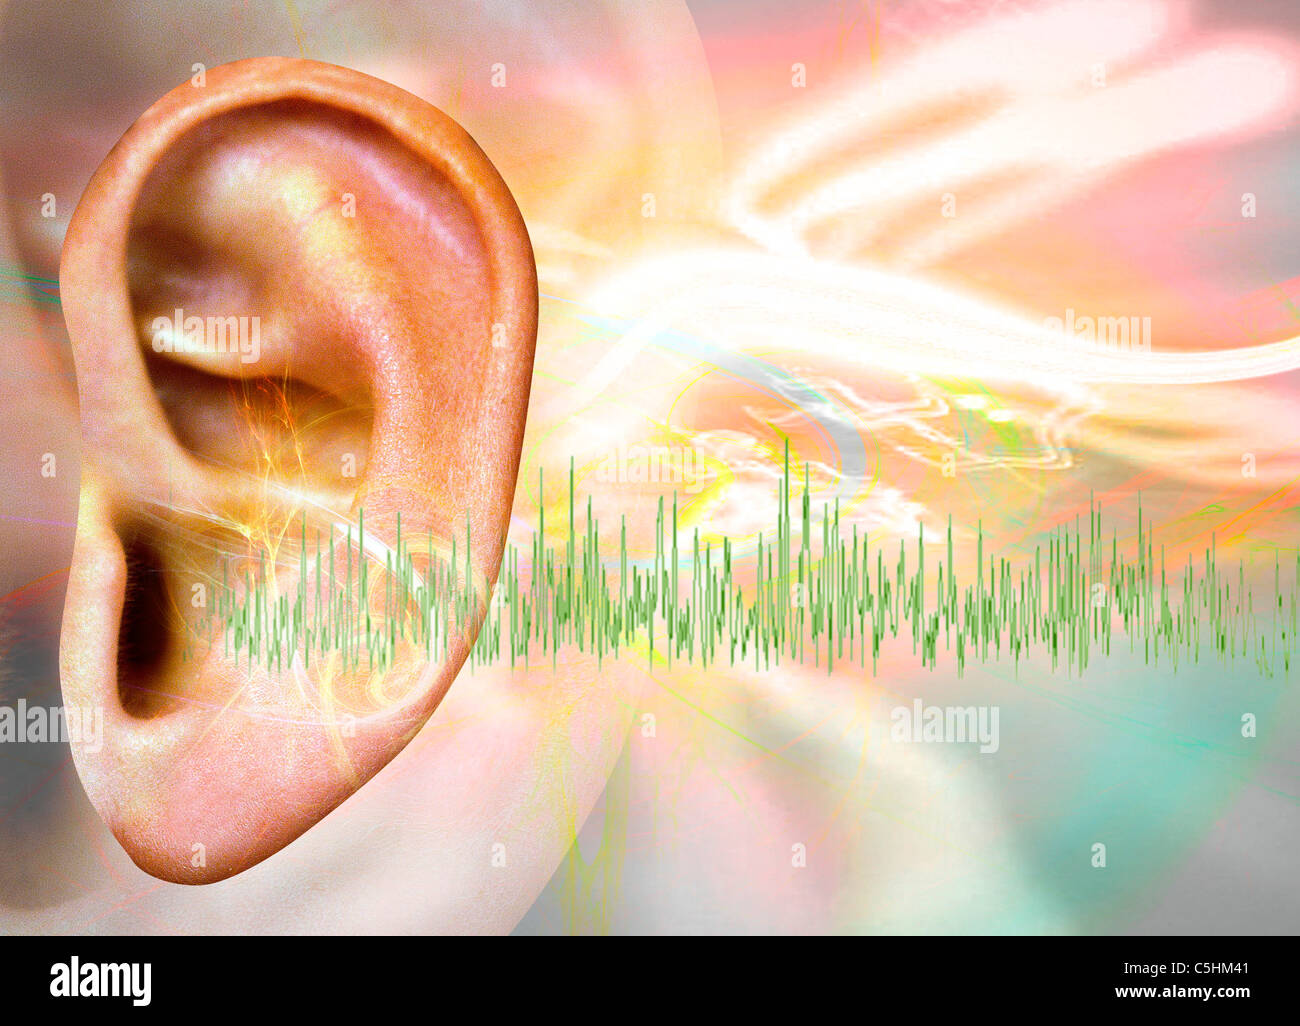 Anatomy Ear Human Outer Ear Medicine Drawing Sciences Stock Photos